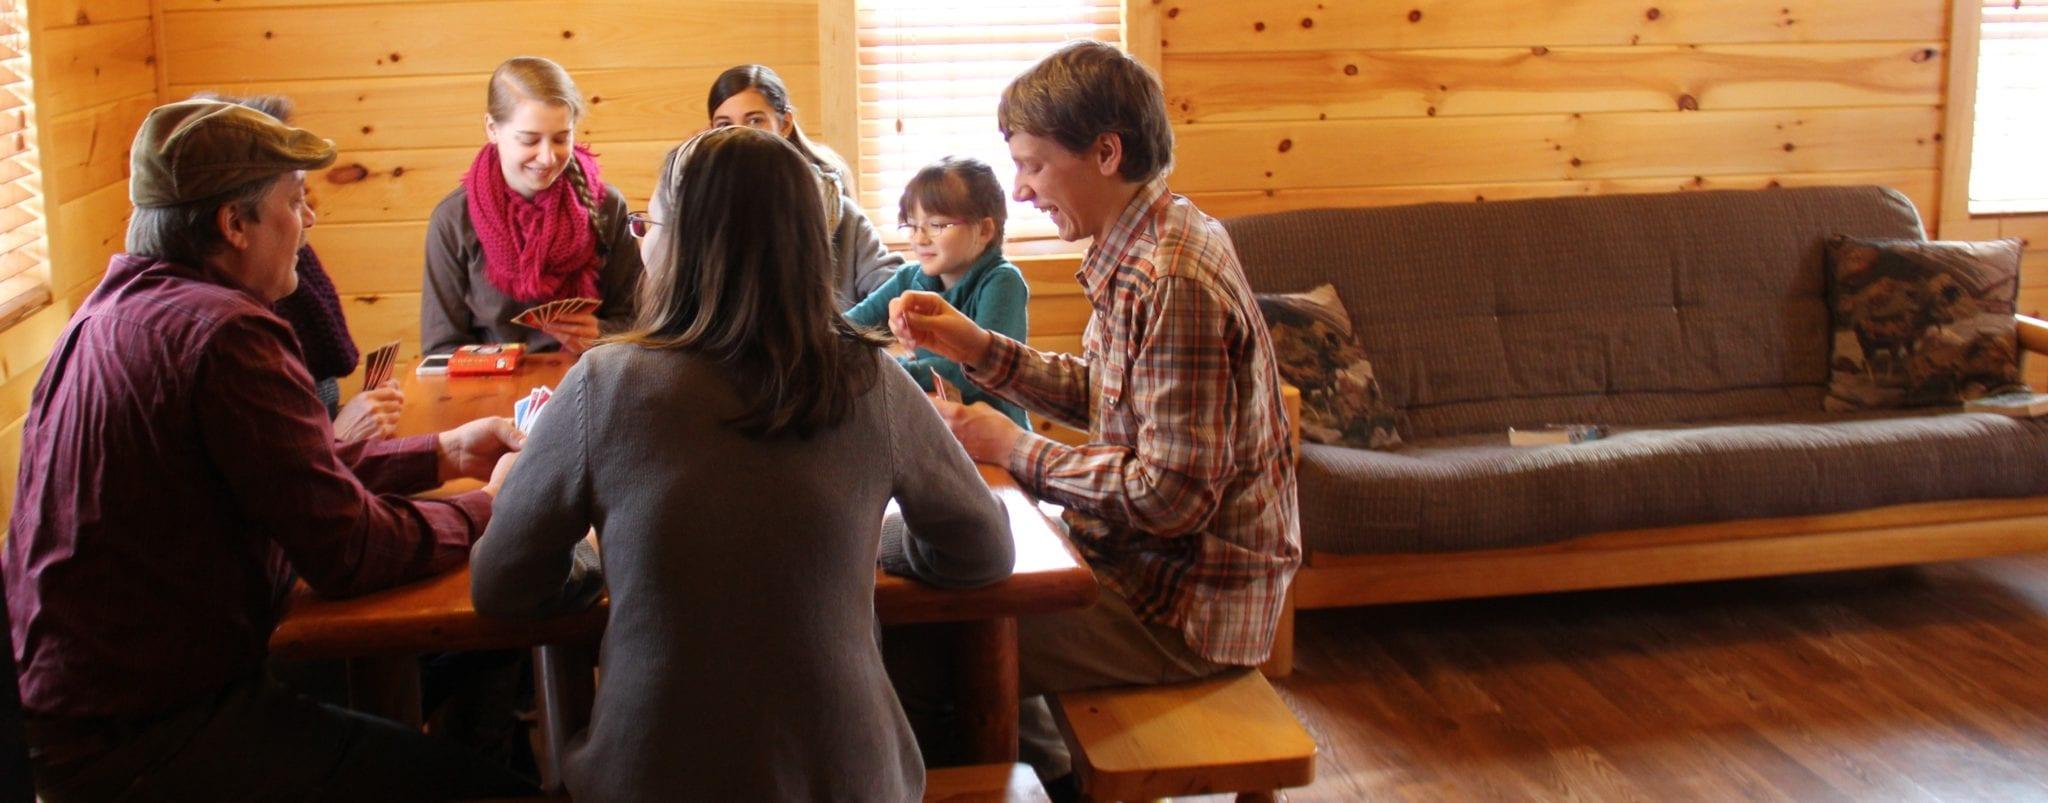 Family-Cabin-Getaway-Slider